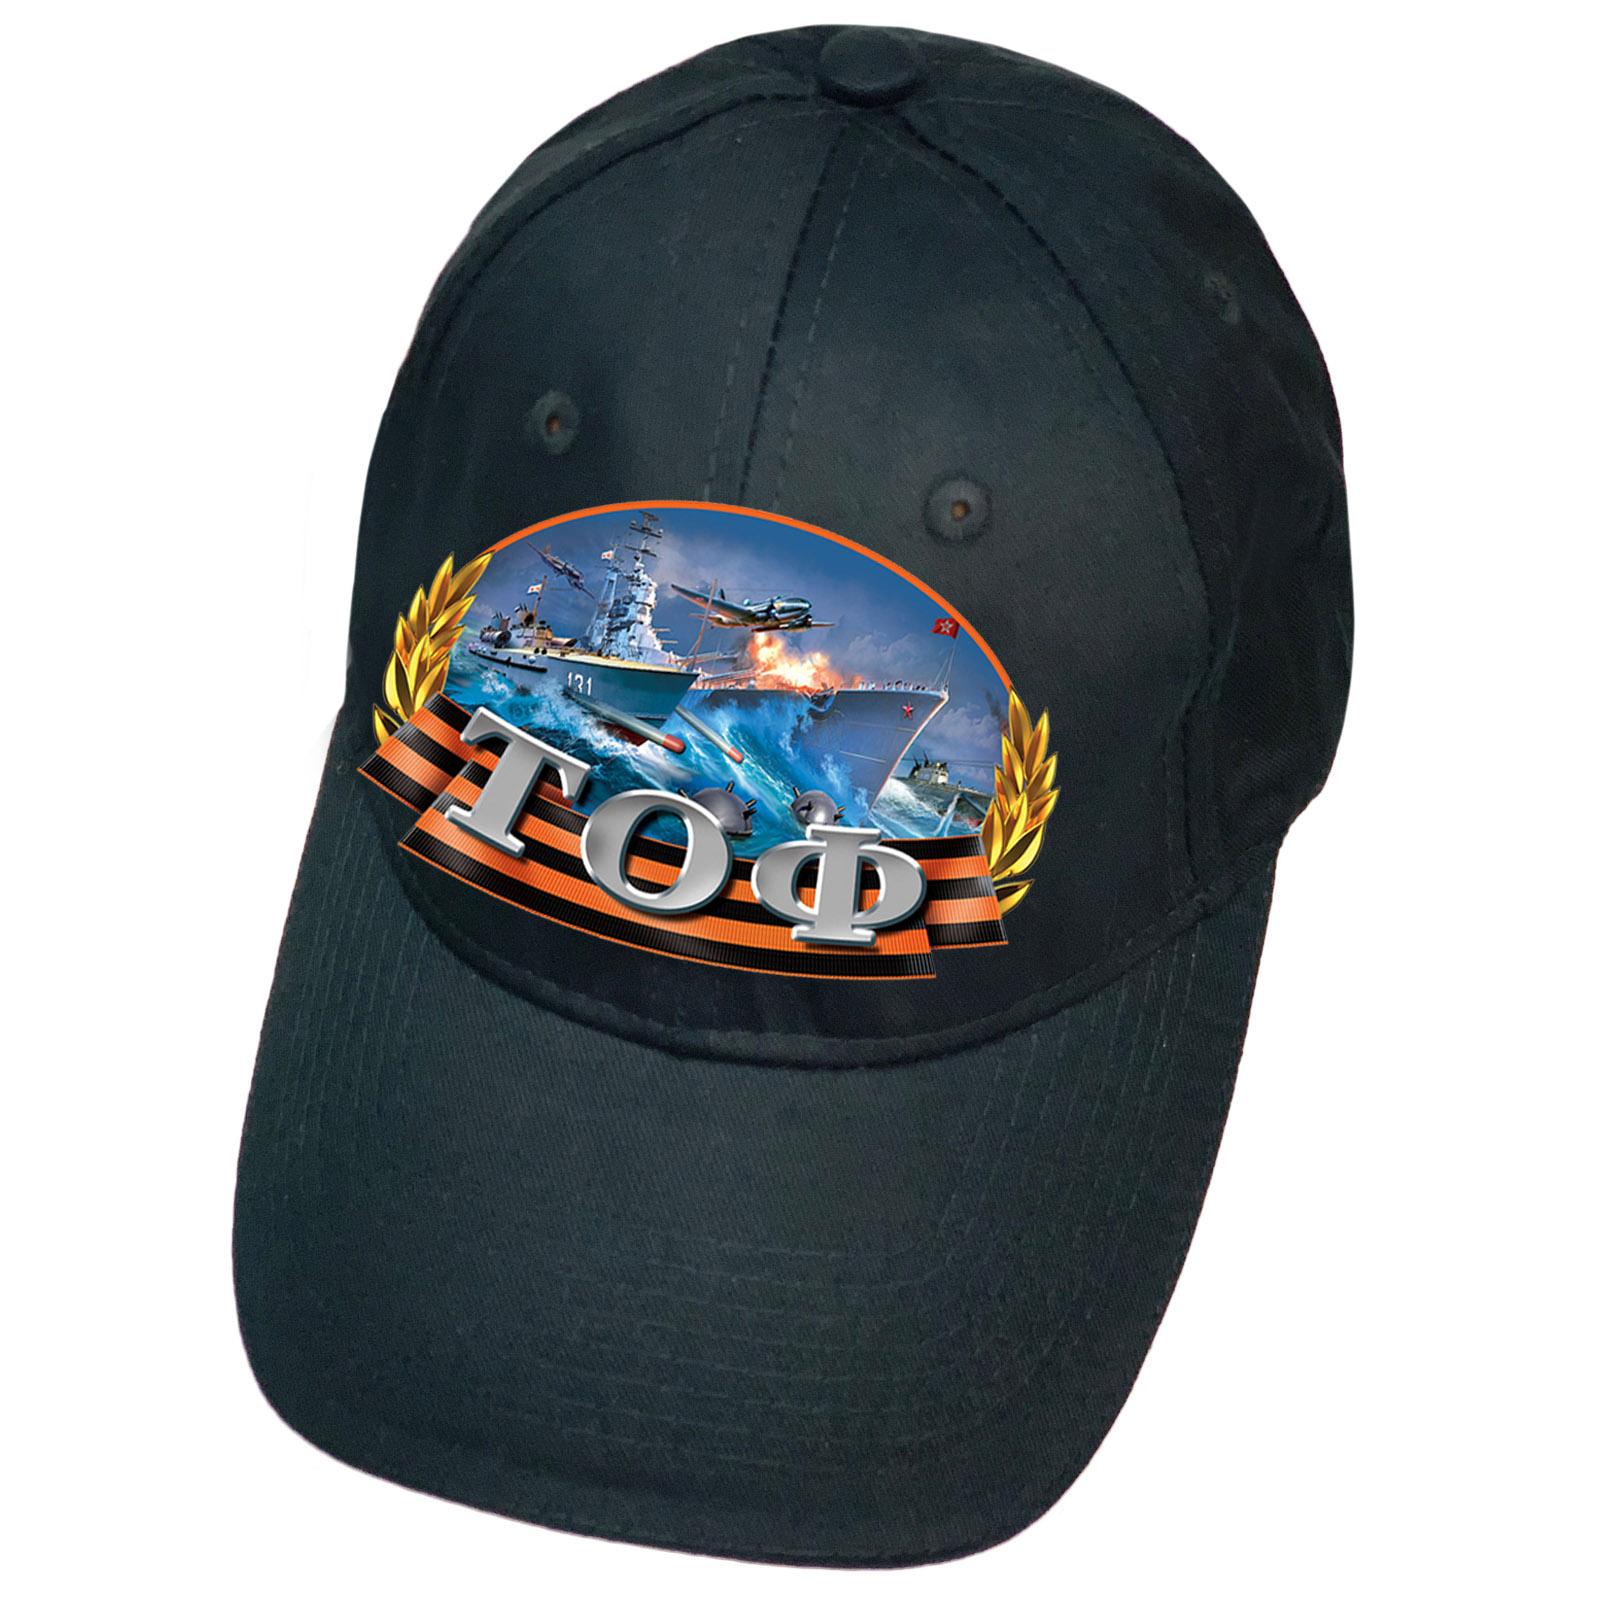 Тёмно-синяя кепка с термотрансфером ТОФ